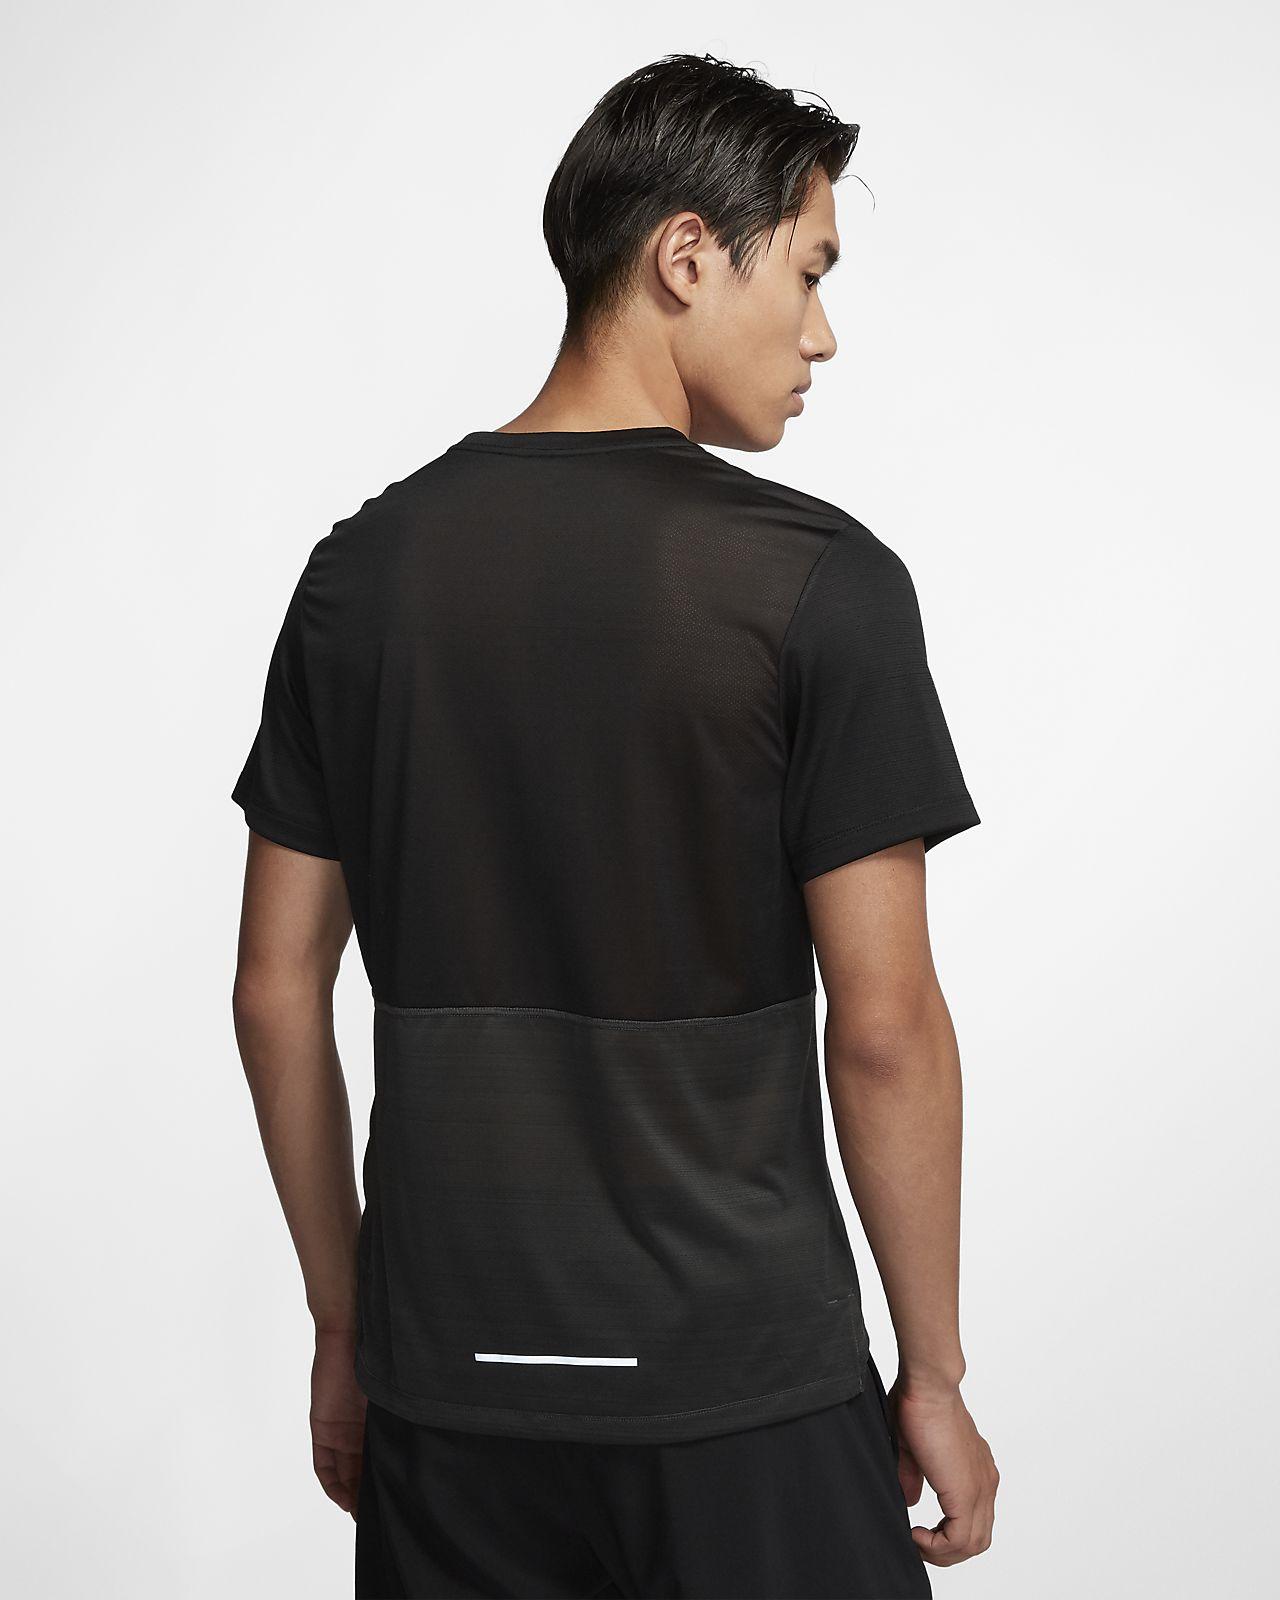 Nike Dri FIT Miler Running Shirt Women barely grey at